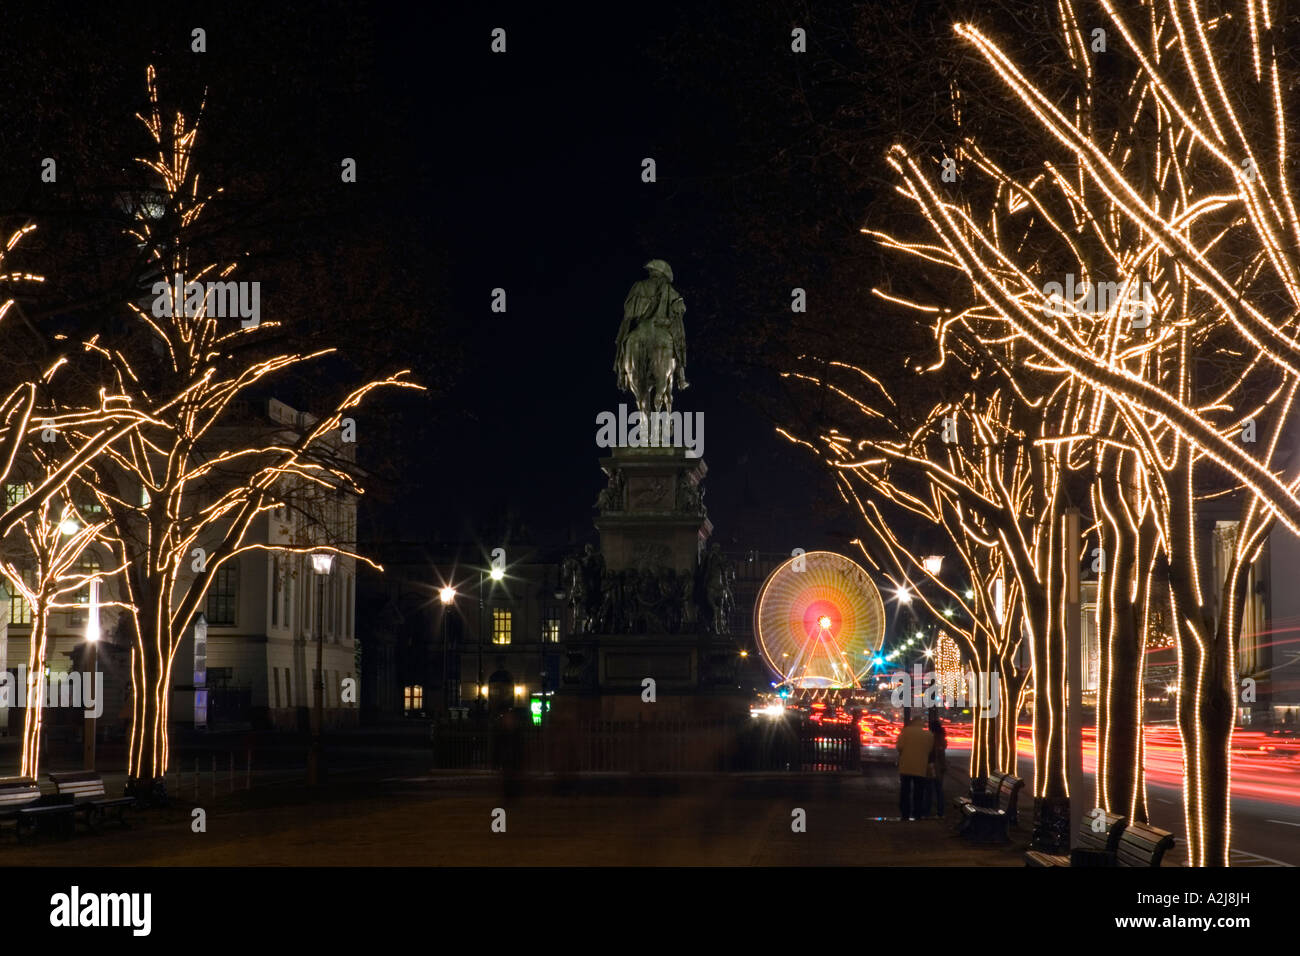 Unter Den Linden Weihnachtsbeleuchtung.Christmas Lights On Trees Lining Unter Den Linden Berlin Germany